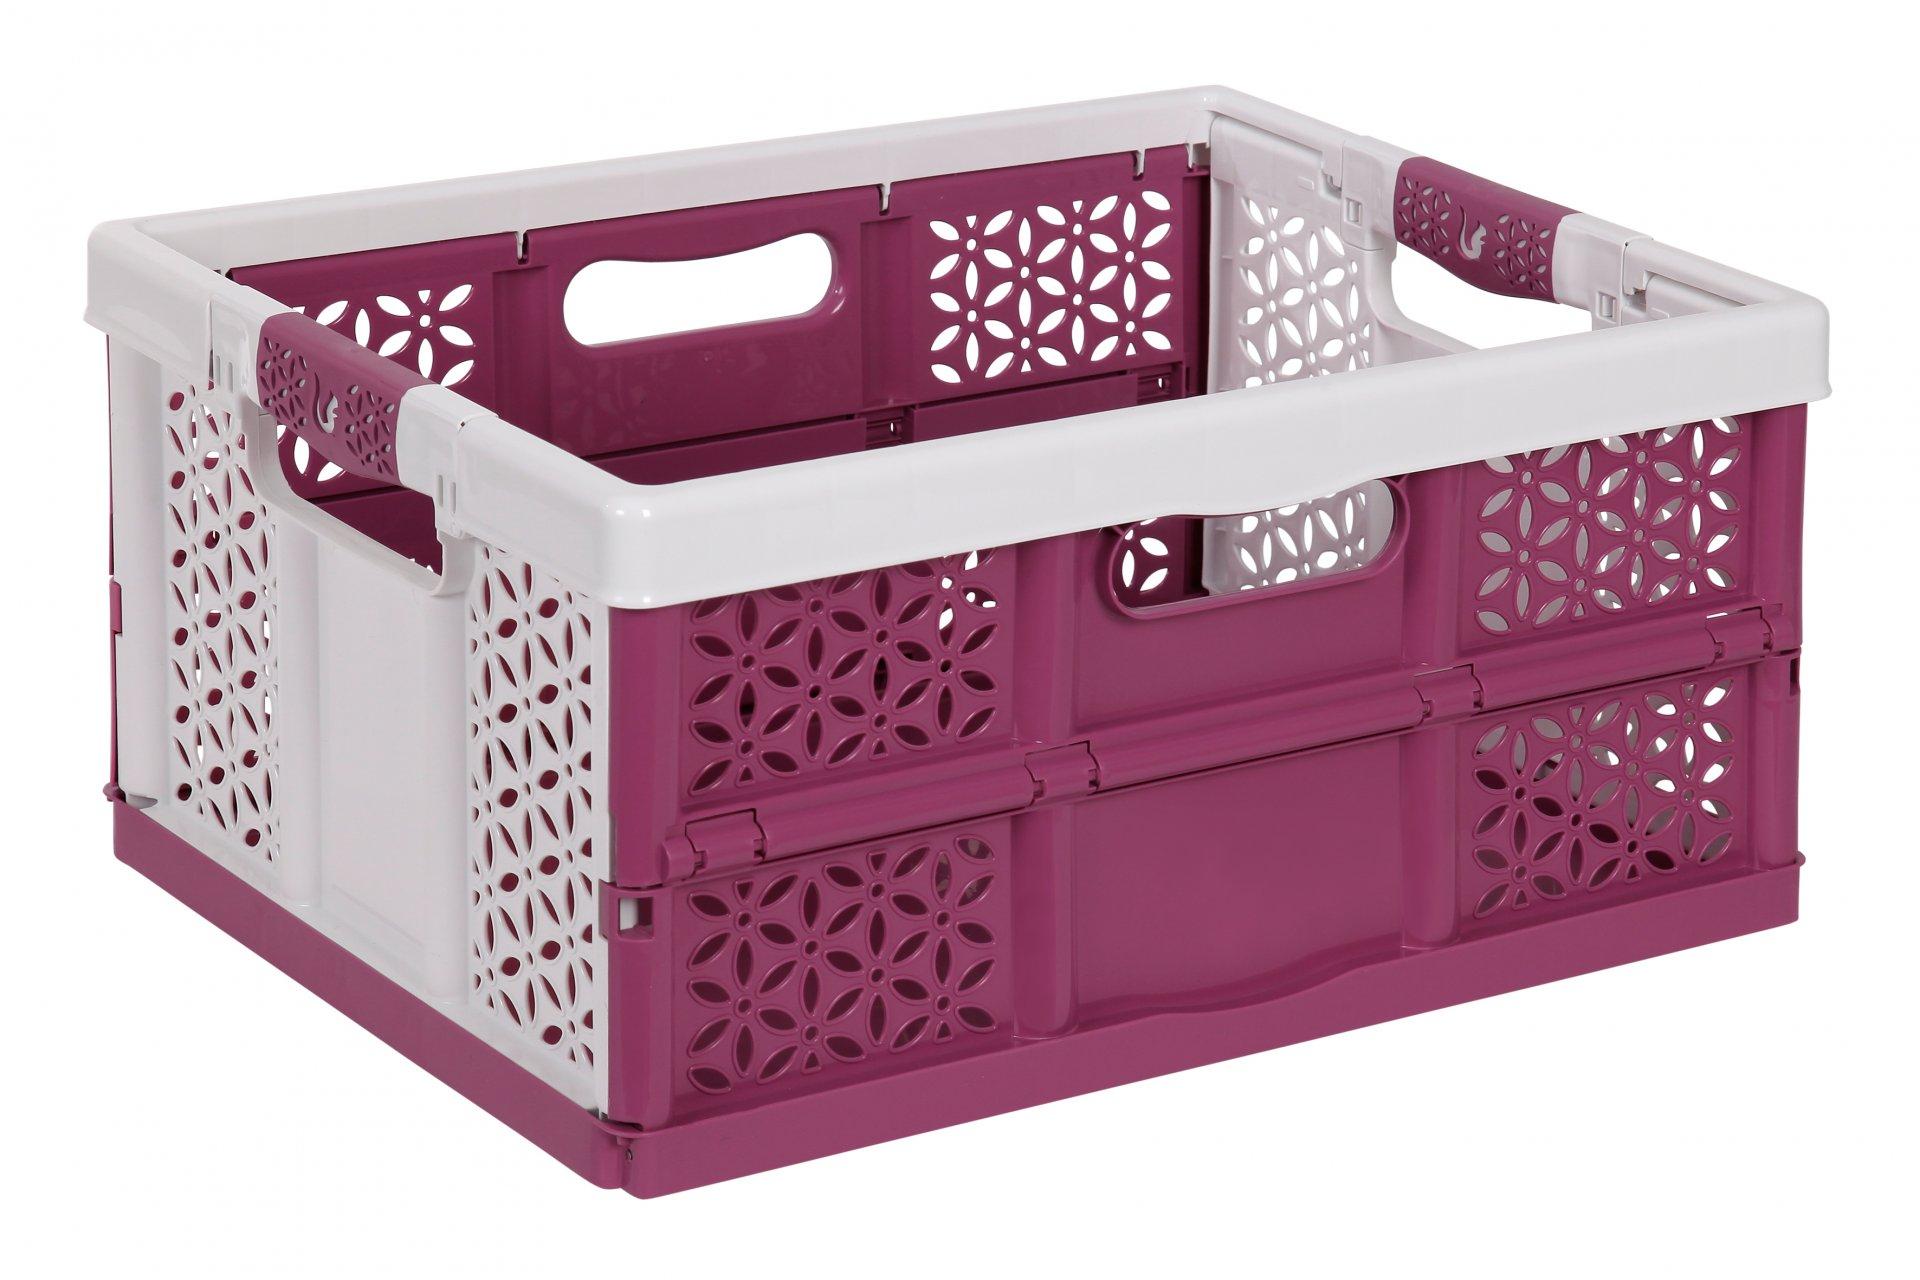 Keeeper Skládací box s měkkými úchyty lea, bílá/vínová 32L